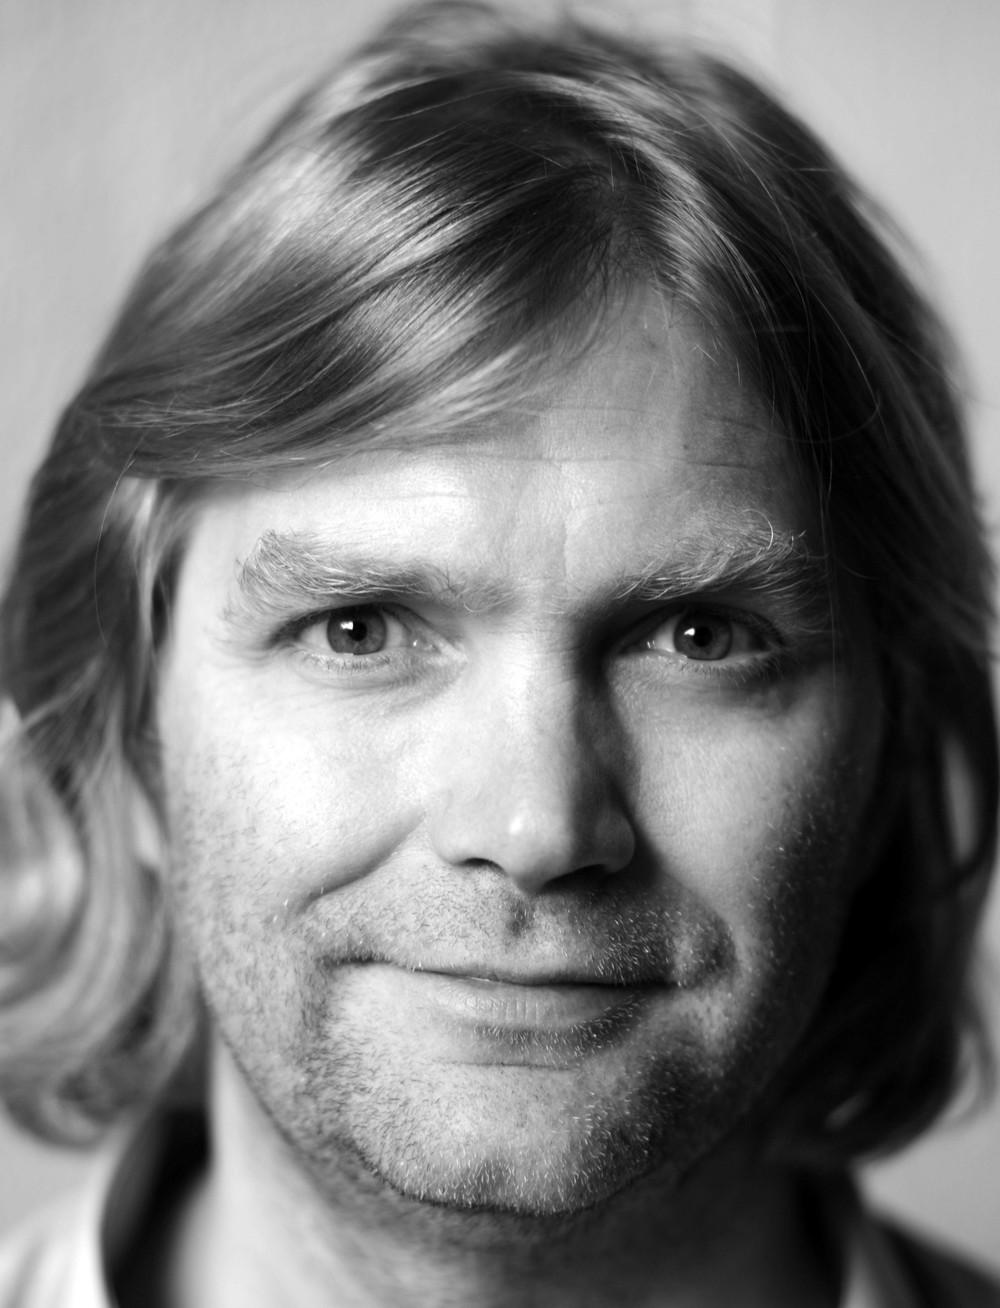 Tharald Nustad - Executive Board Member